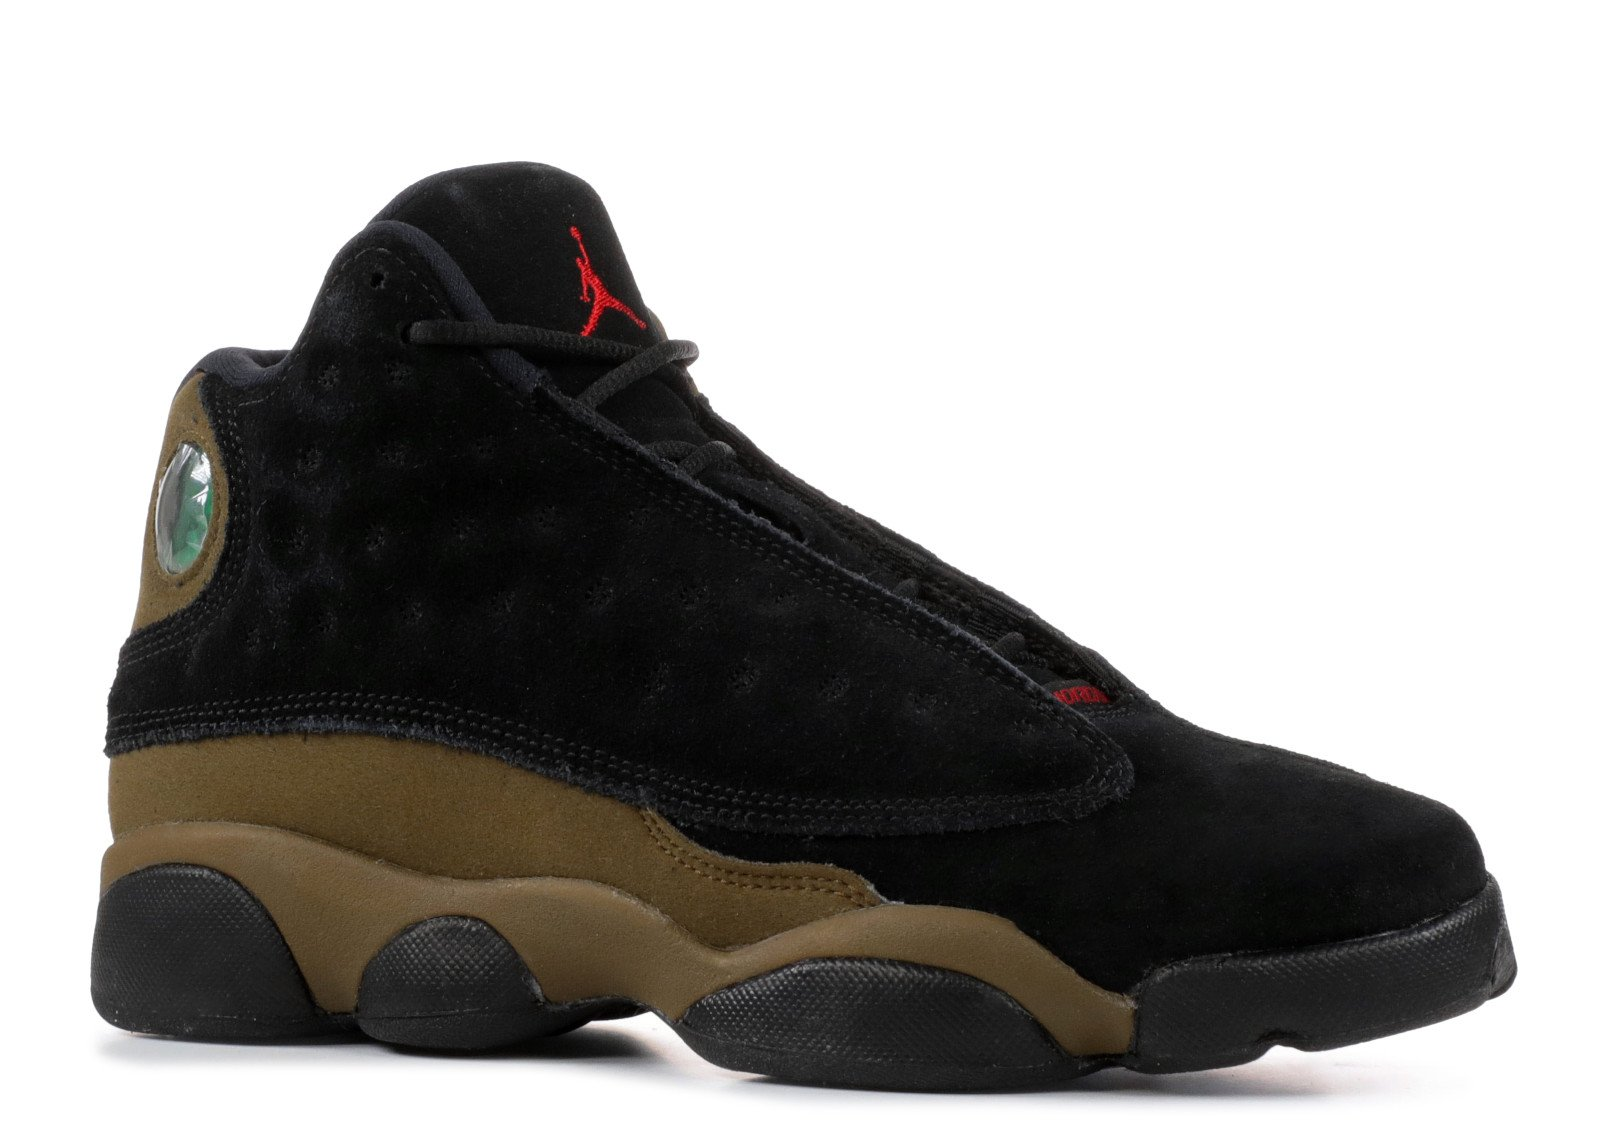 Jordan Air 13 Retro BG Big Kids Sneakers Black/Gym Red/Light Olive 884129-006 (7 M US)